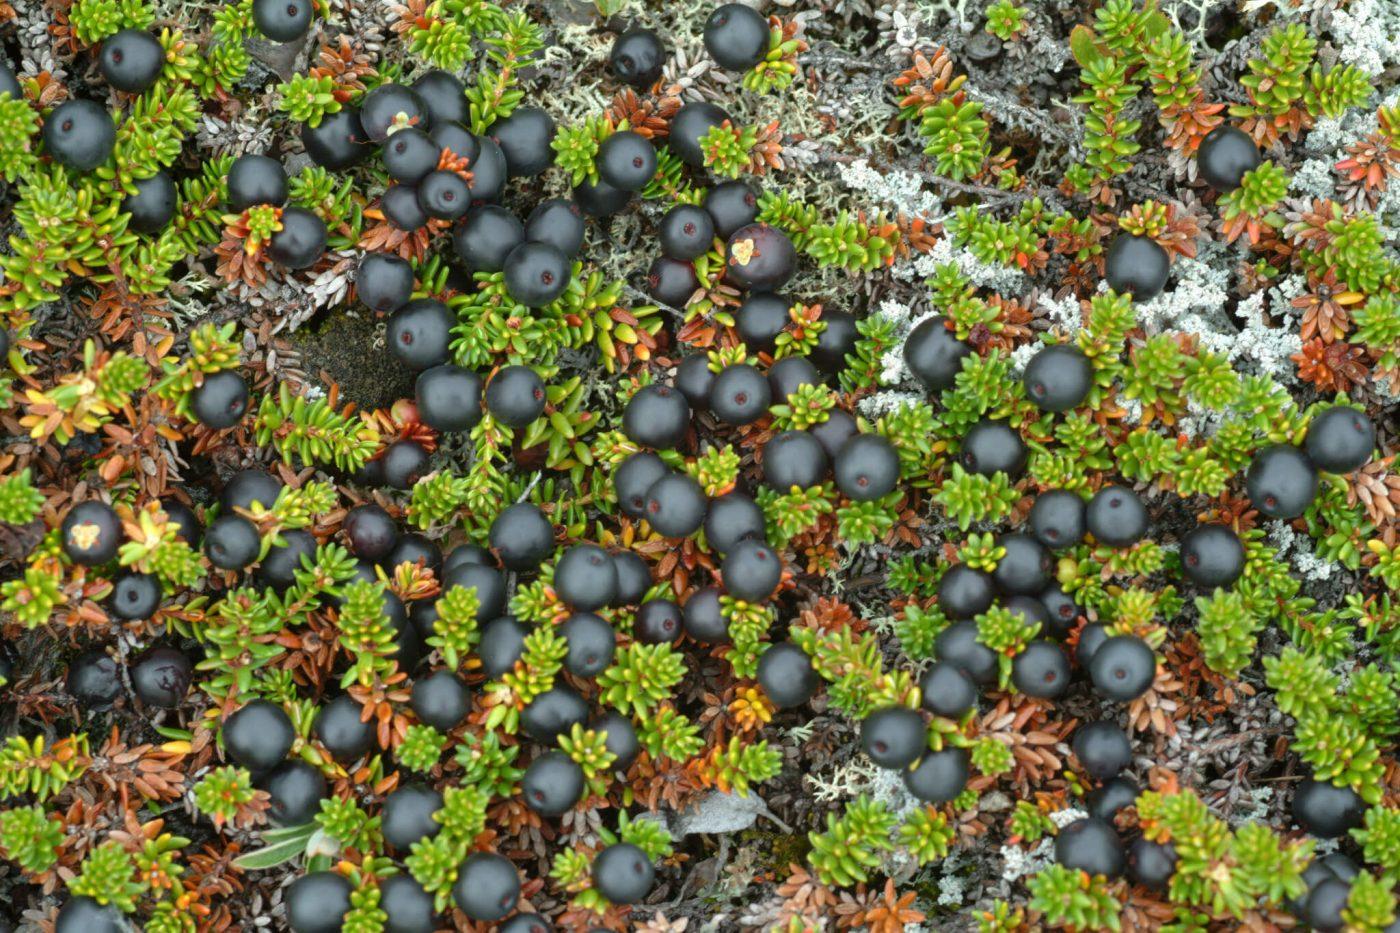 Blackberries in Greenland, by Visit Greenland